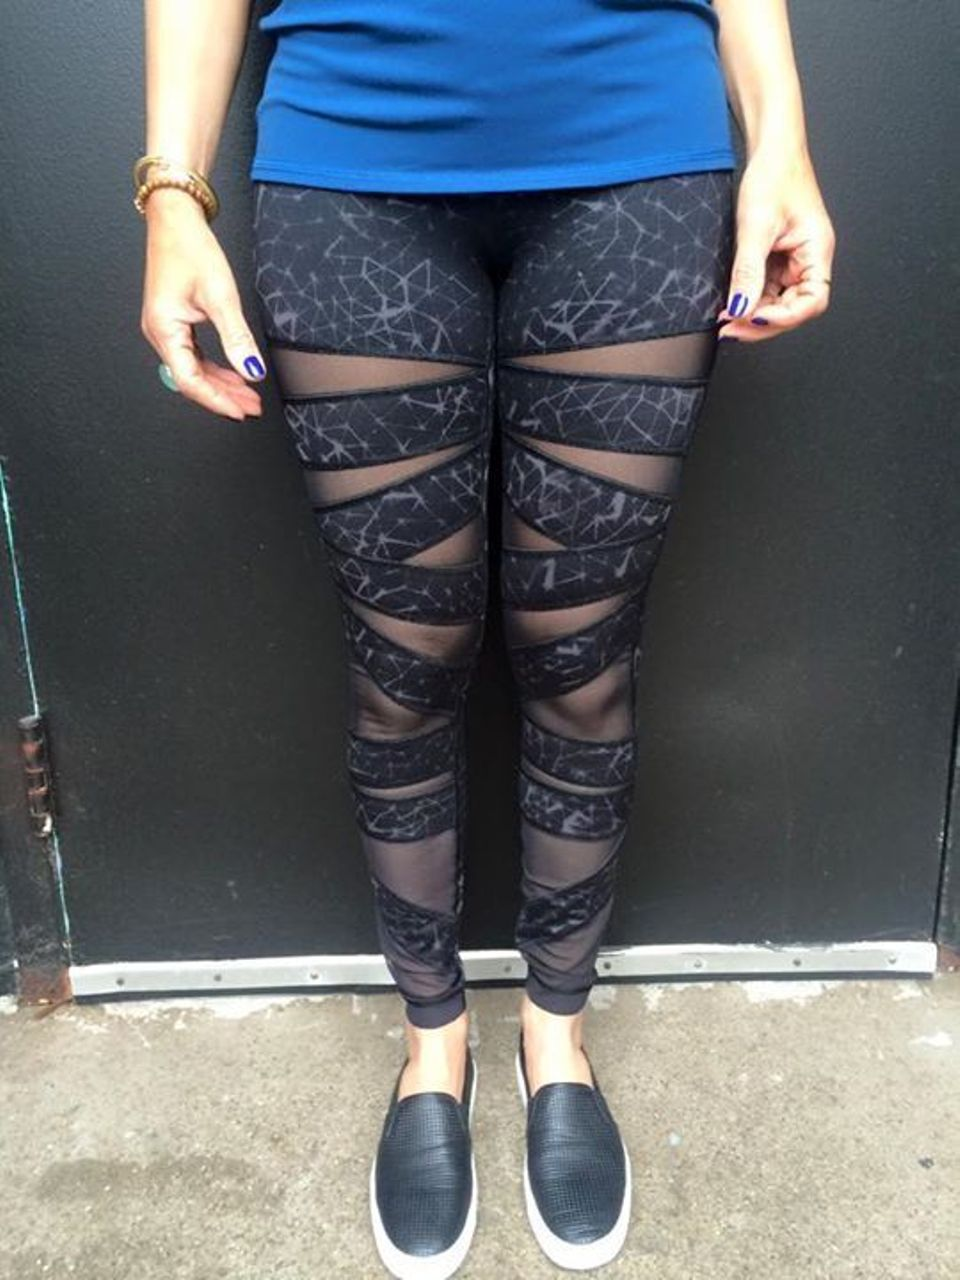 Lululemon High Times Pant *Full-On Luon (Mesh) - Star Crushed Coal Black / Black